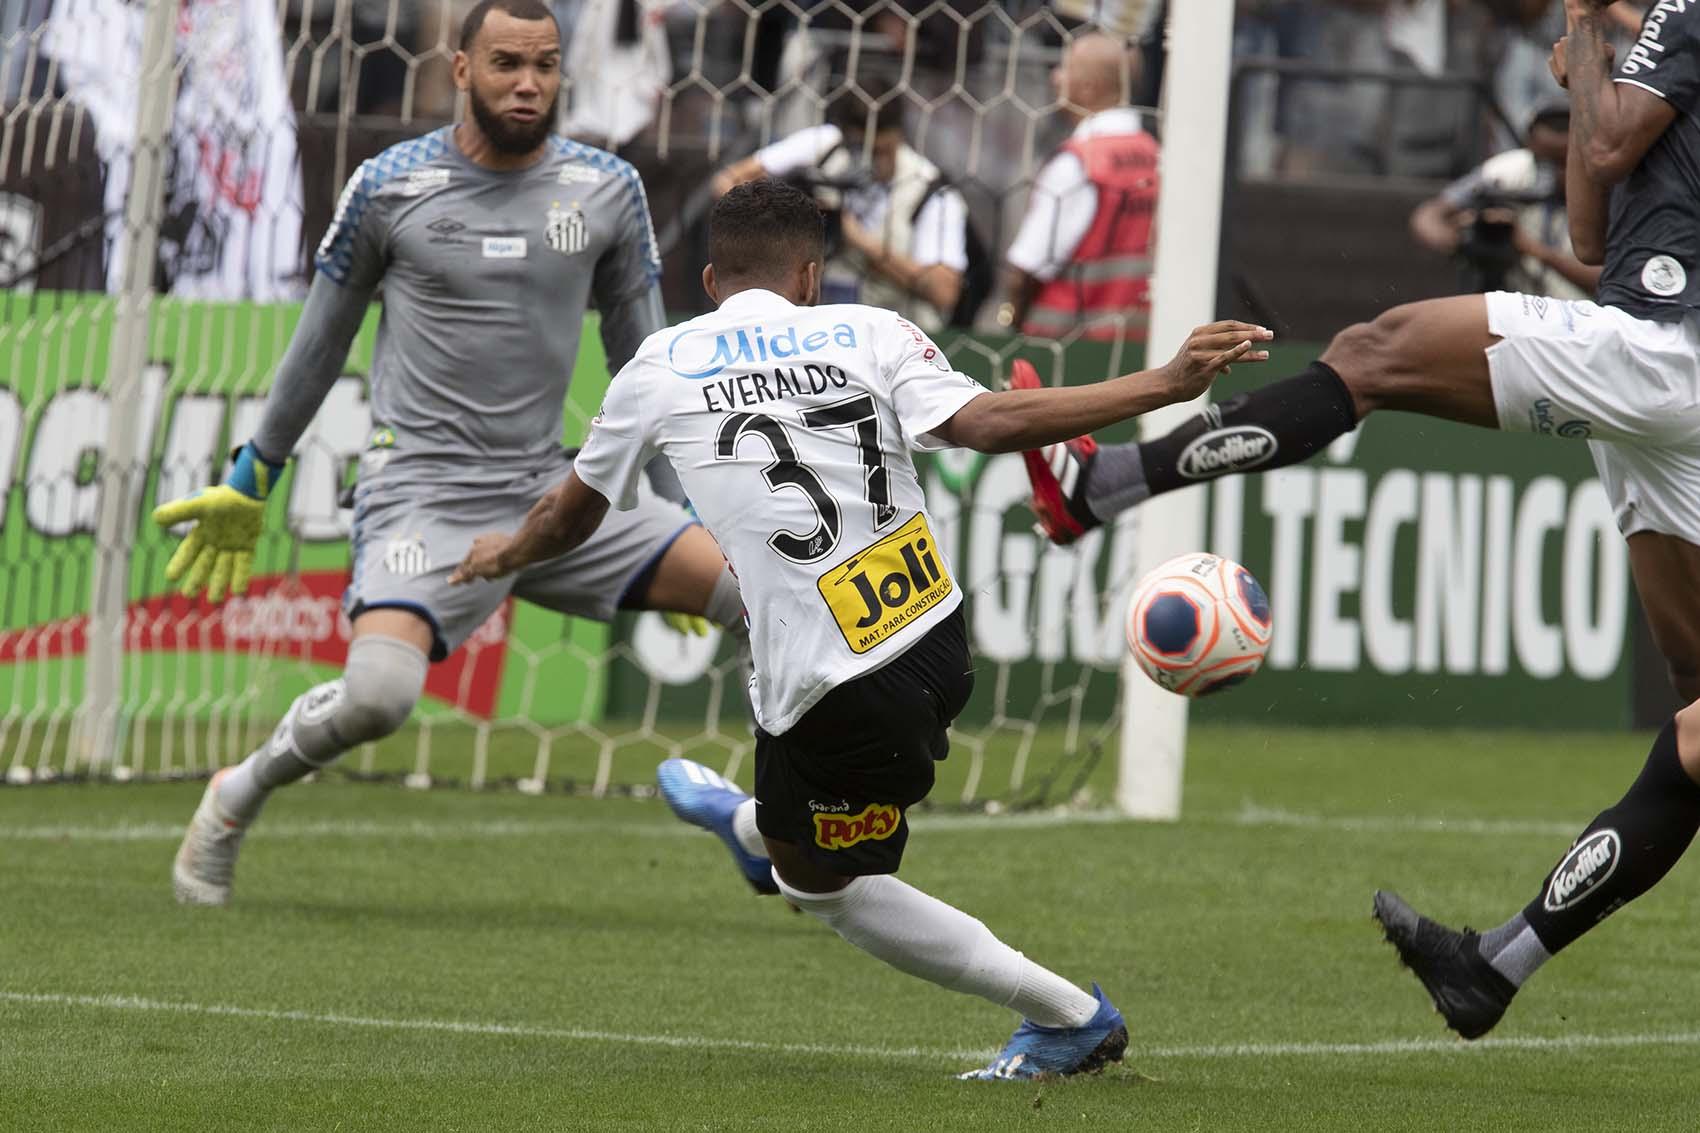 Everaldo - Gol - Corinthians 2 x 0 Santos